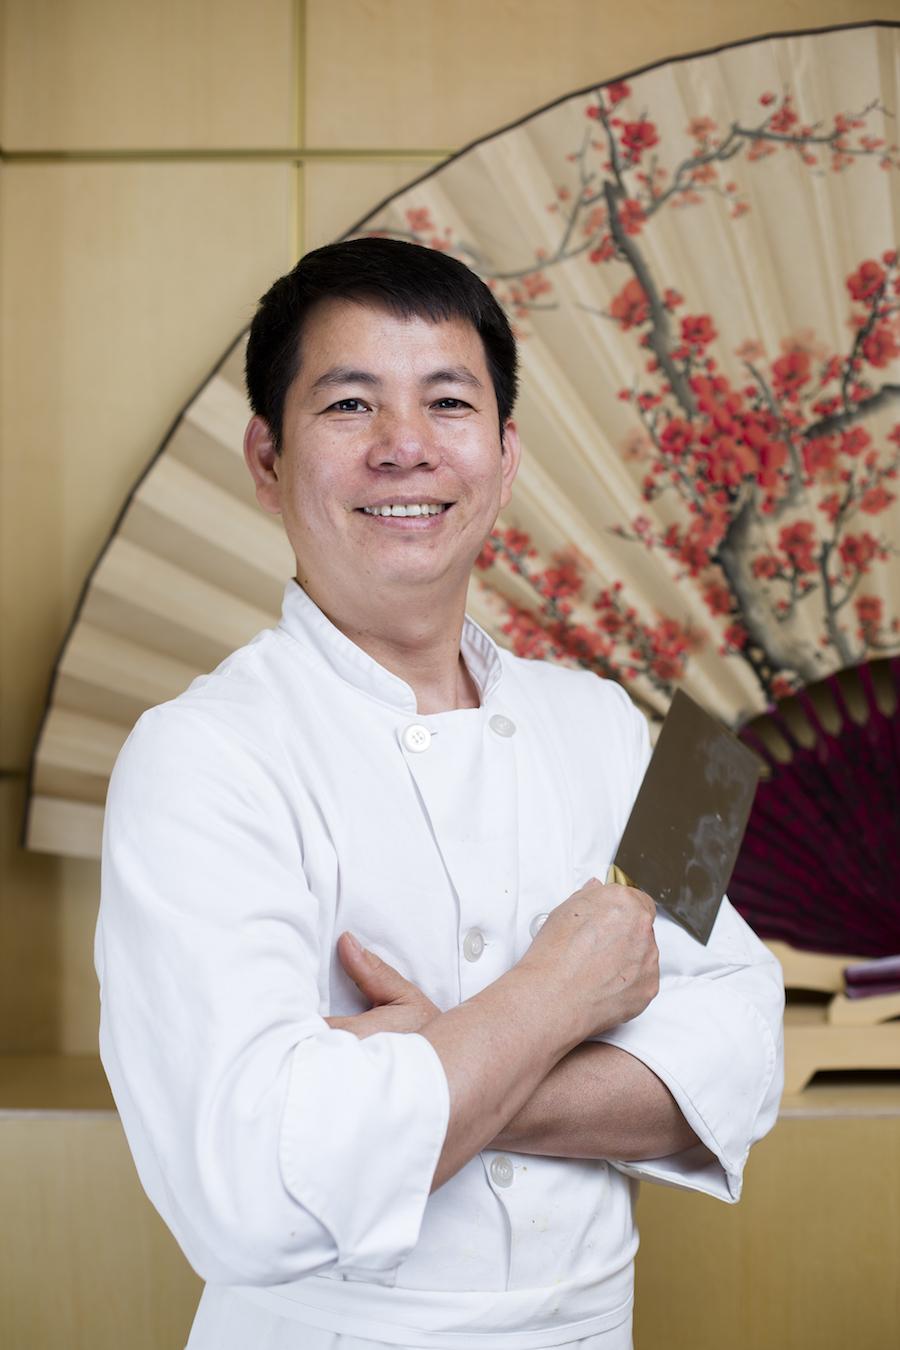 Chef Zizhao Luo. (Samira Bouaou/Epoch Times)